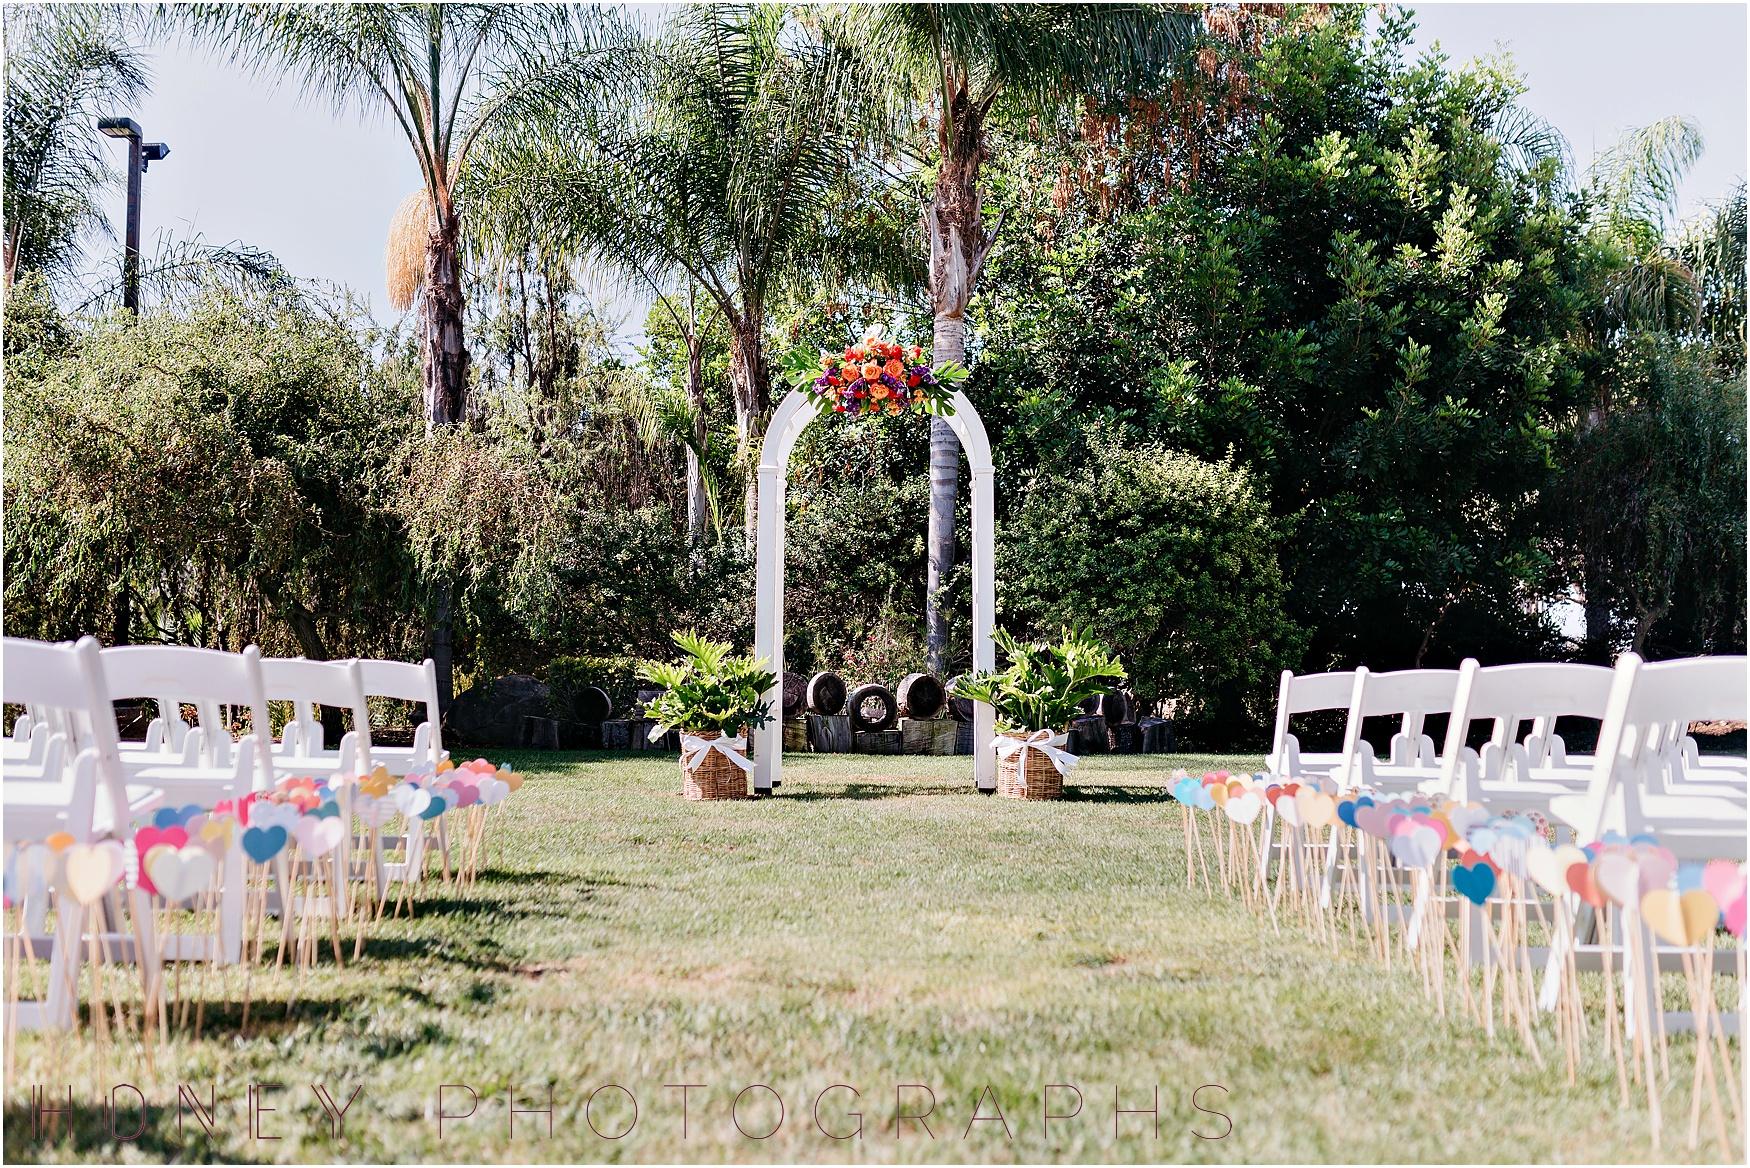 colorful_ecclectic_vibrant_vista_rainbow_quirky_wedding010.jpg